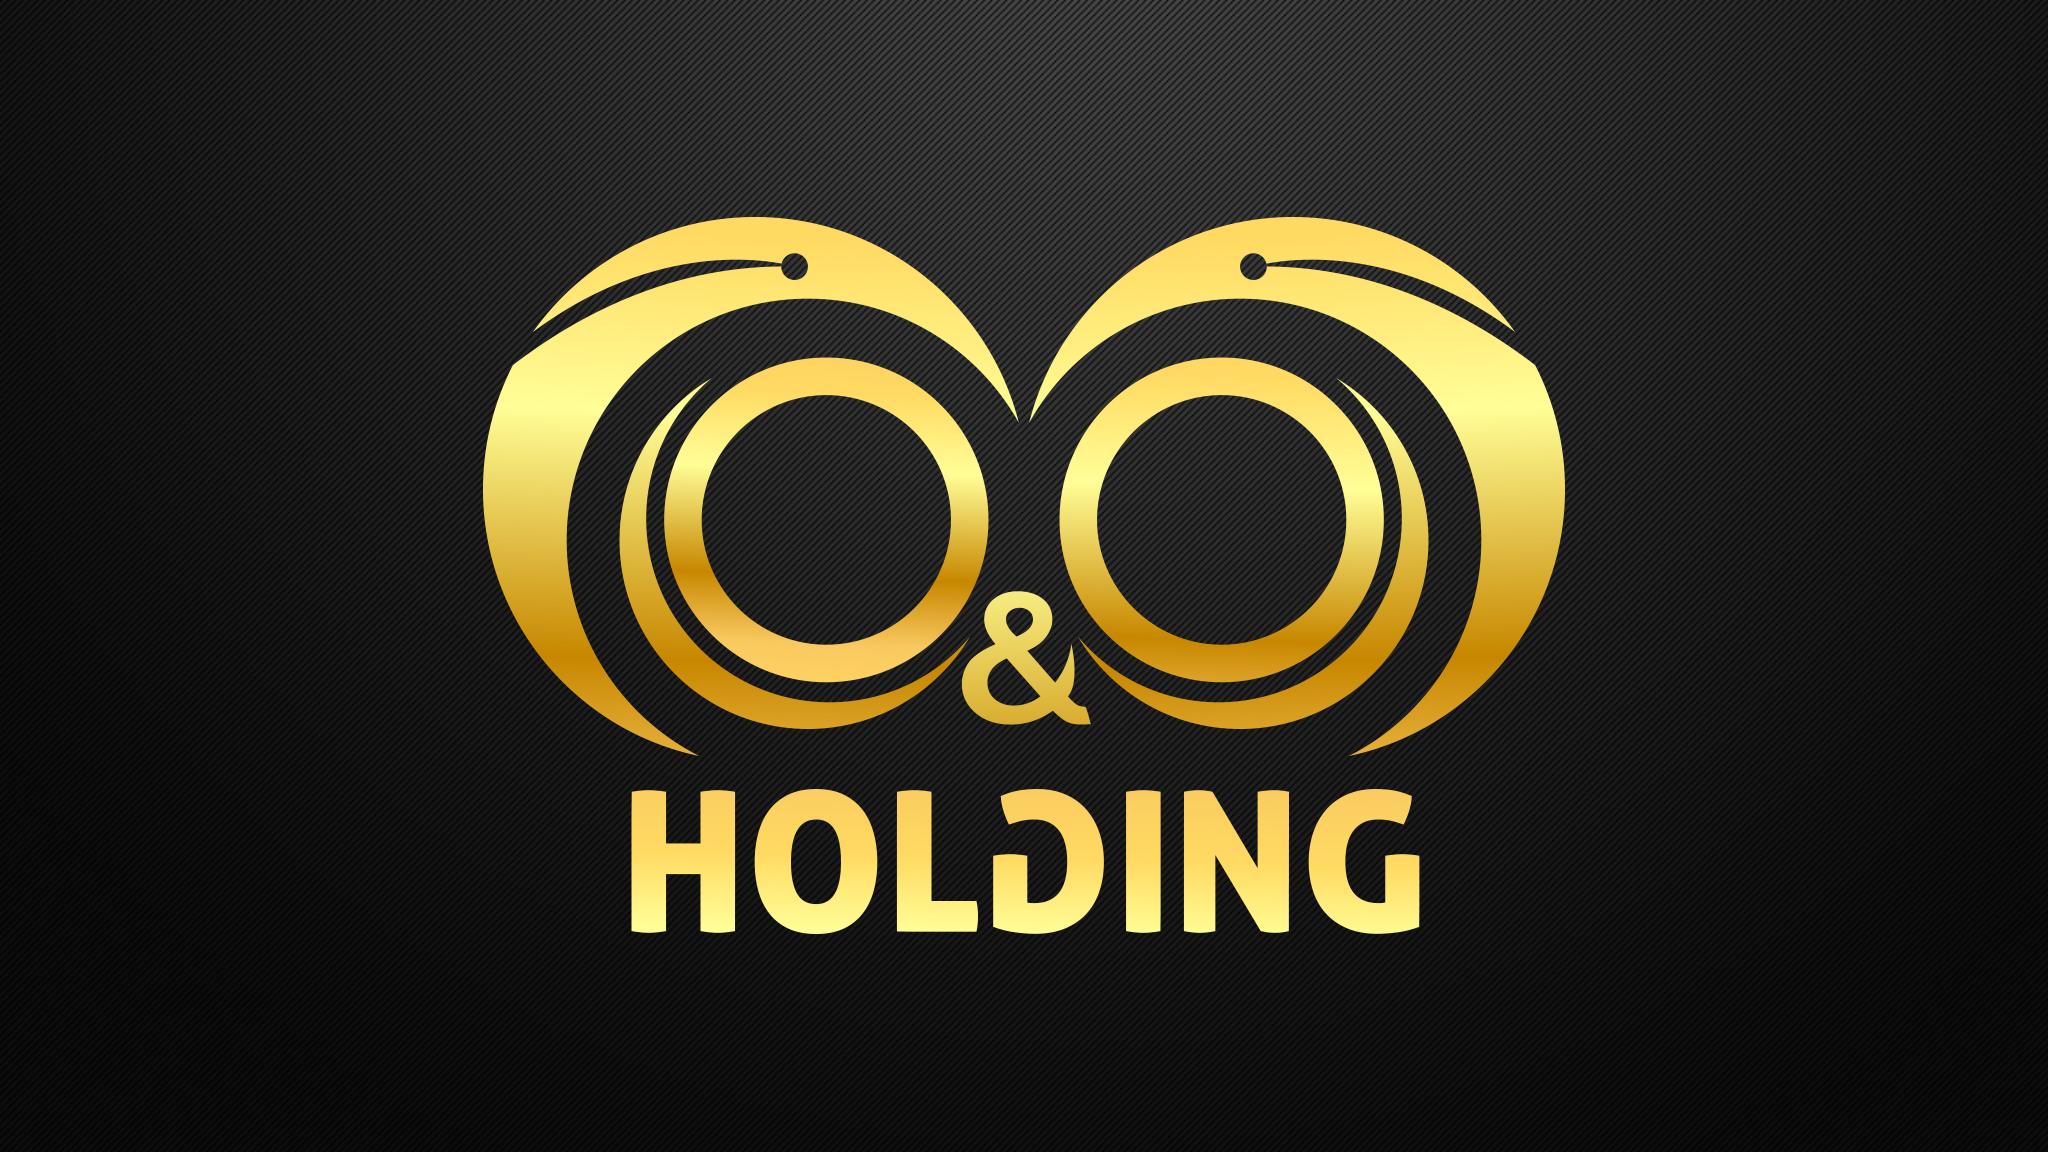 "Разработка Логотипа +  Фирменного знака для компании ""O & O HOLDING"" фото f_8045c7e210349bd9.jpg"